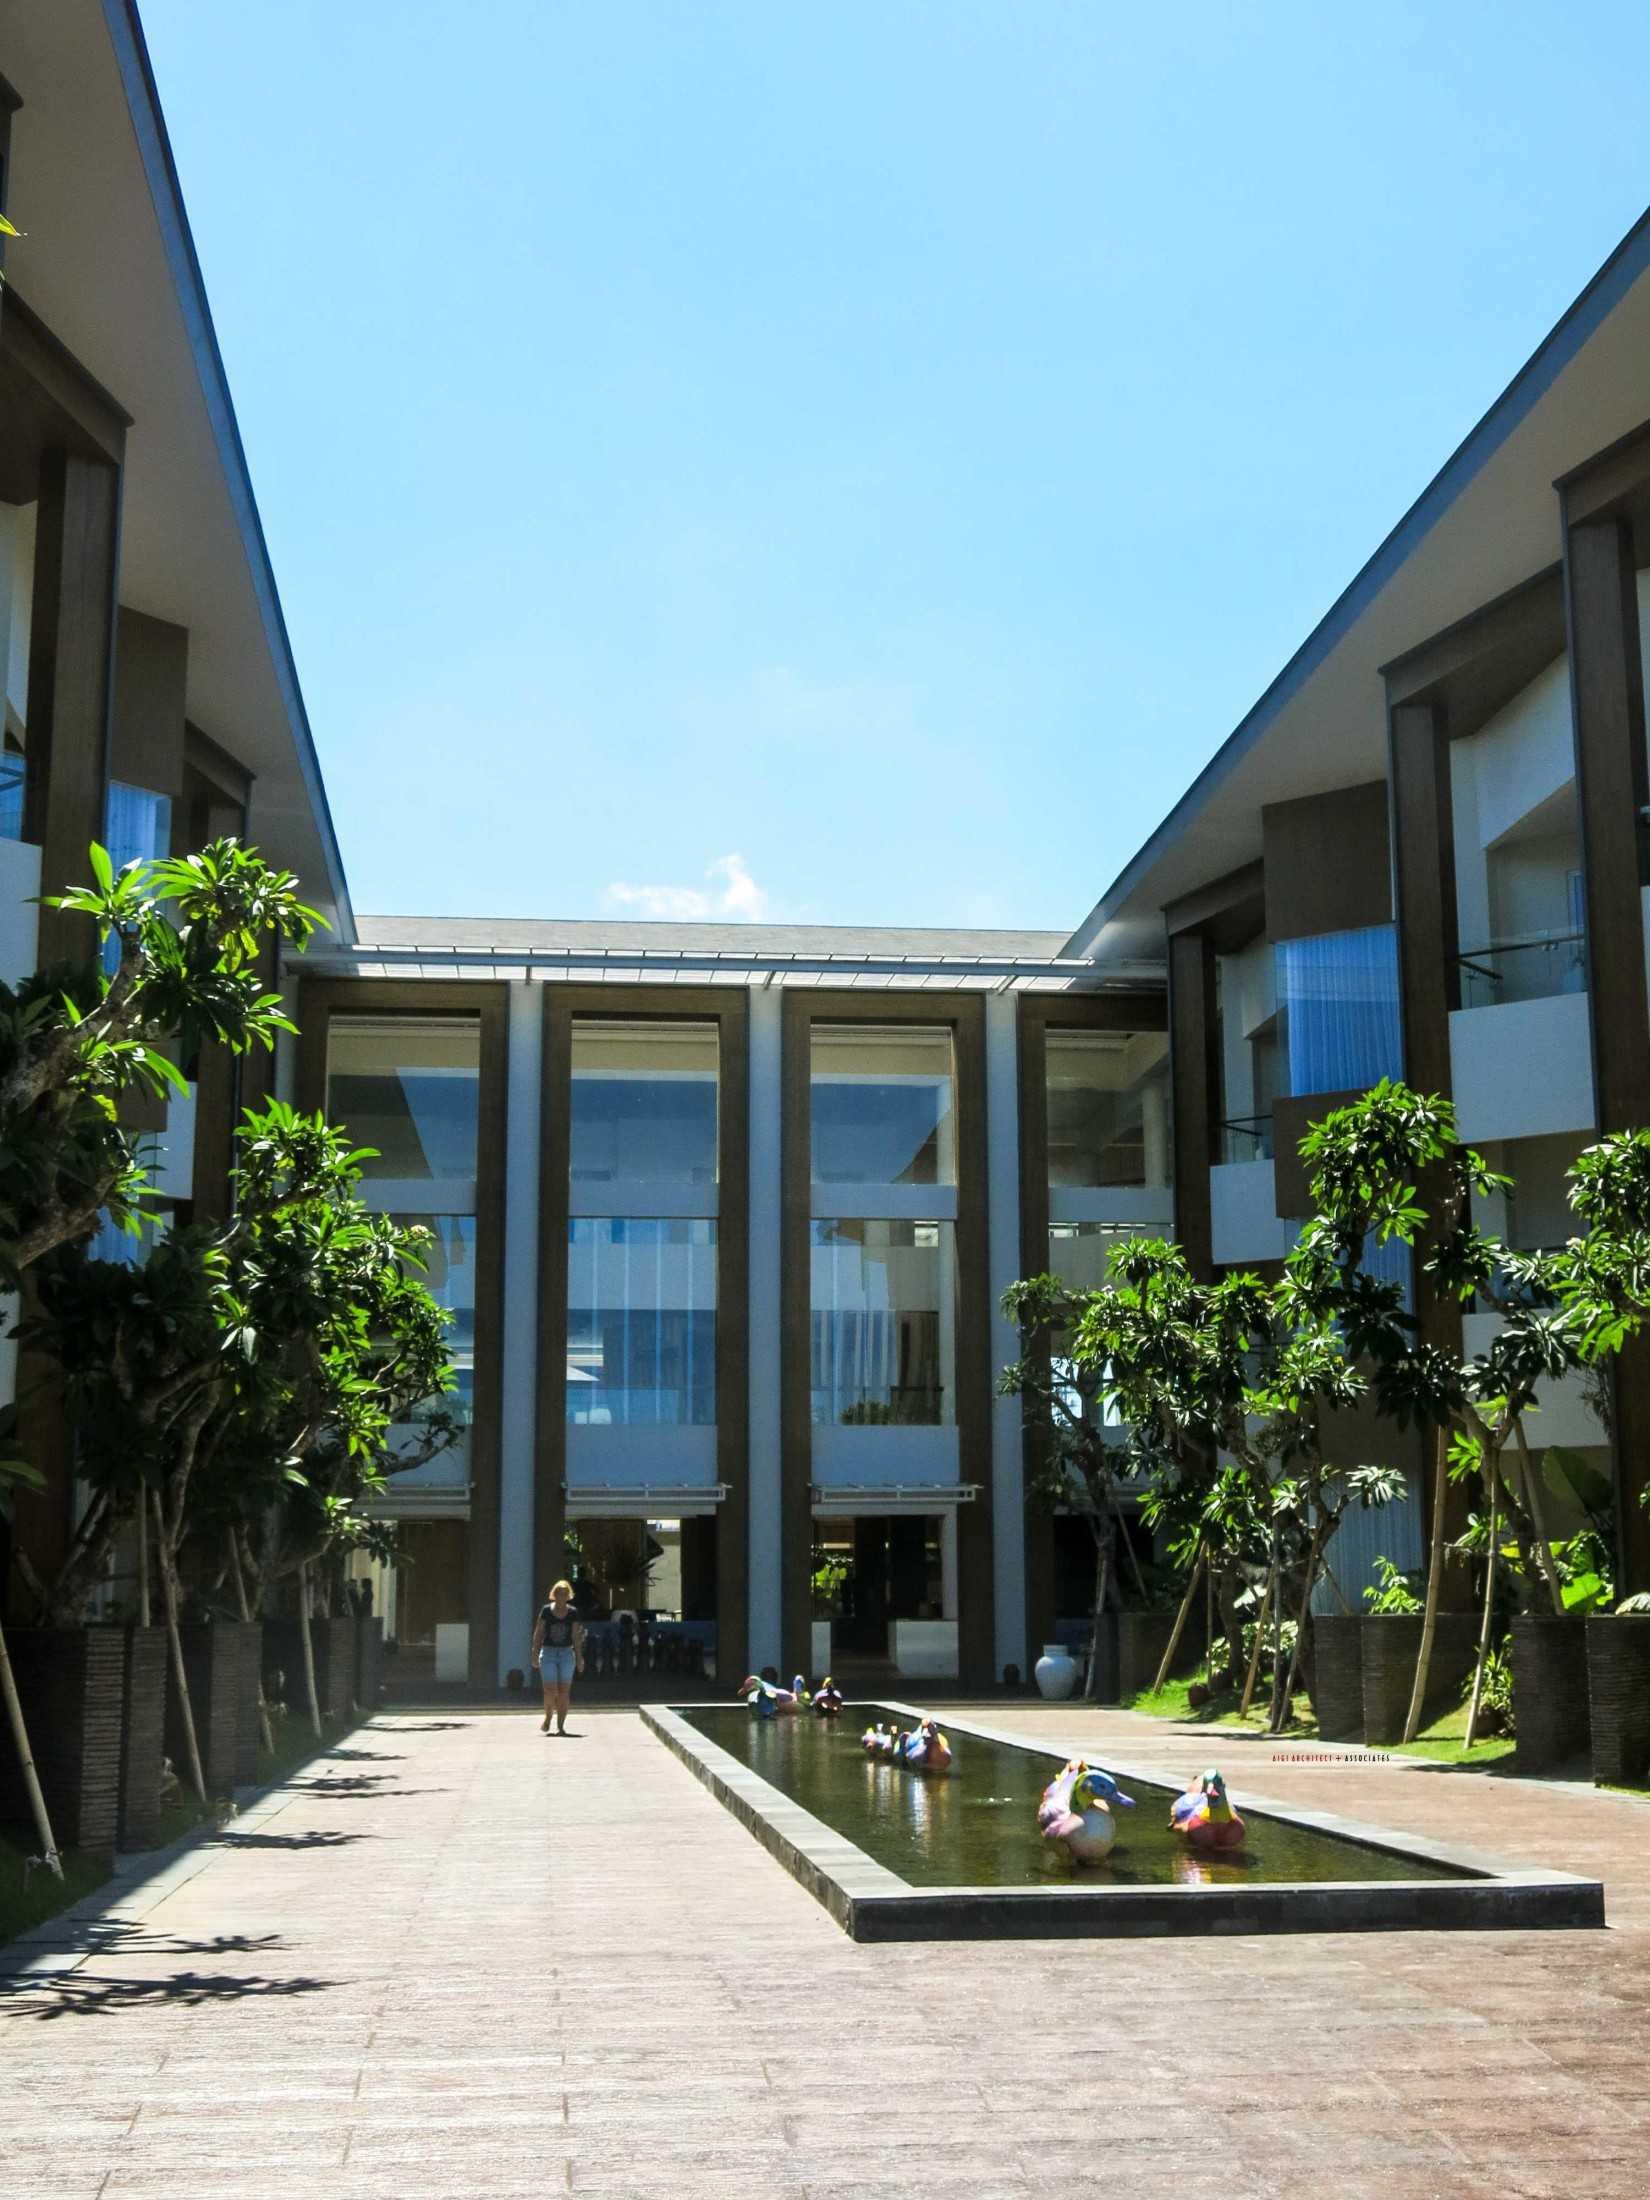 Arnold Iskandar G Intan Adapted To Present Tj. Benoa, Kuta Sel., Kabupaten Badung, Bali, Indonesia Tj. Benoa, Kuta Sel., Kabupaten Badung, Bali, Indonesia Arnold-Iskandar-G-Intan-Adapted-To-Present  63361